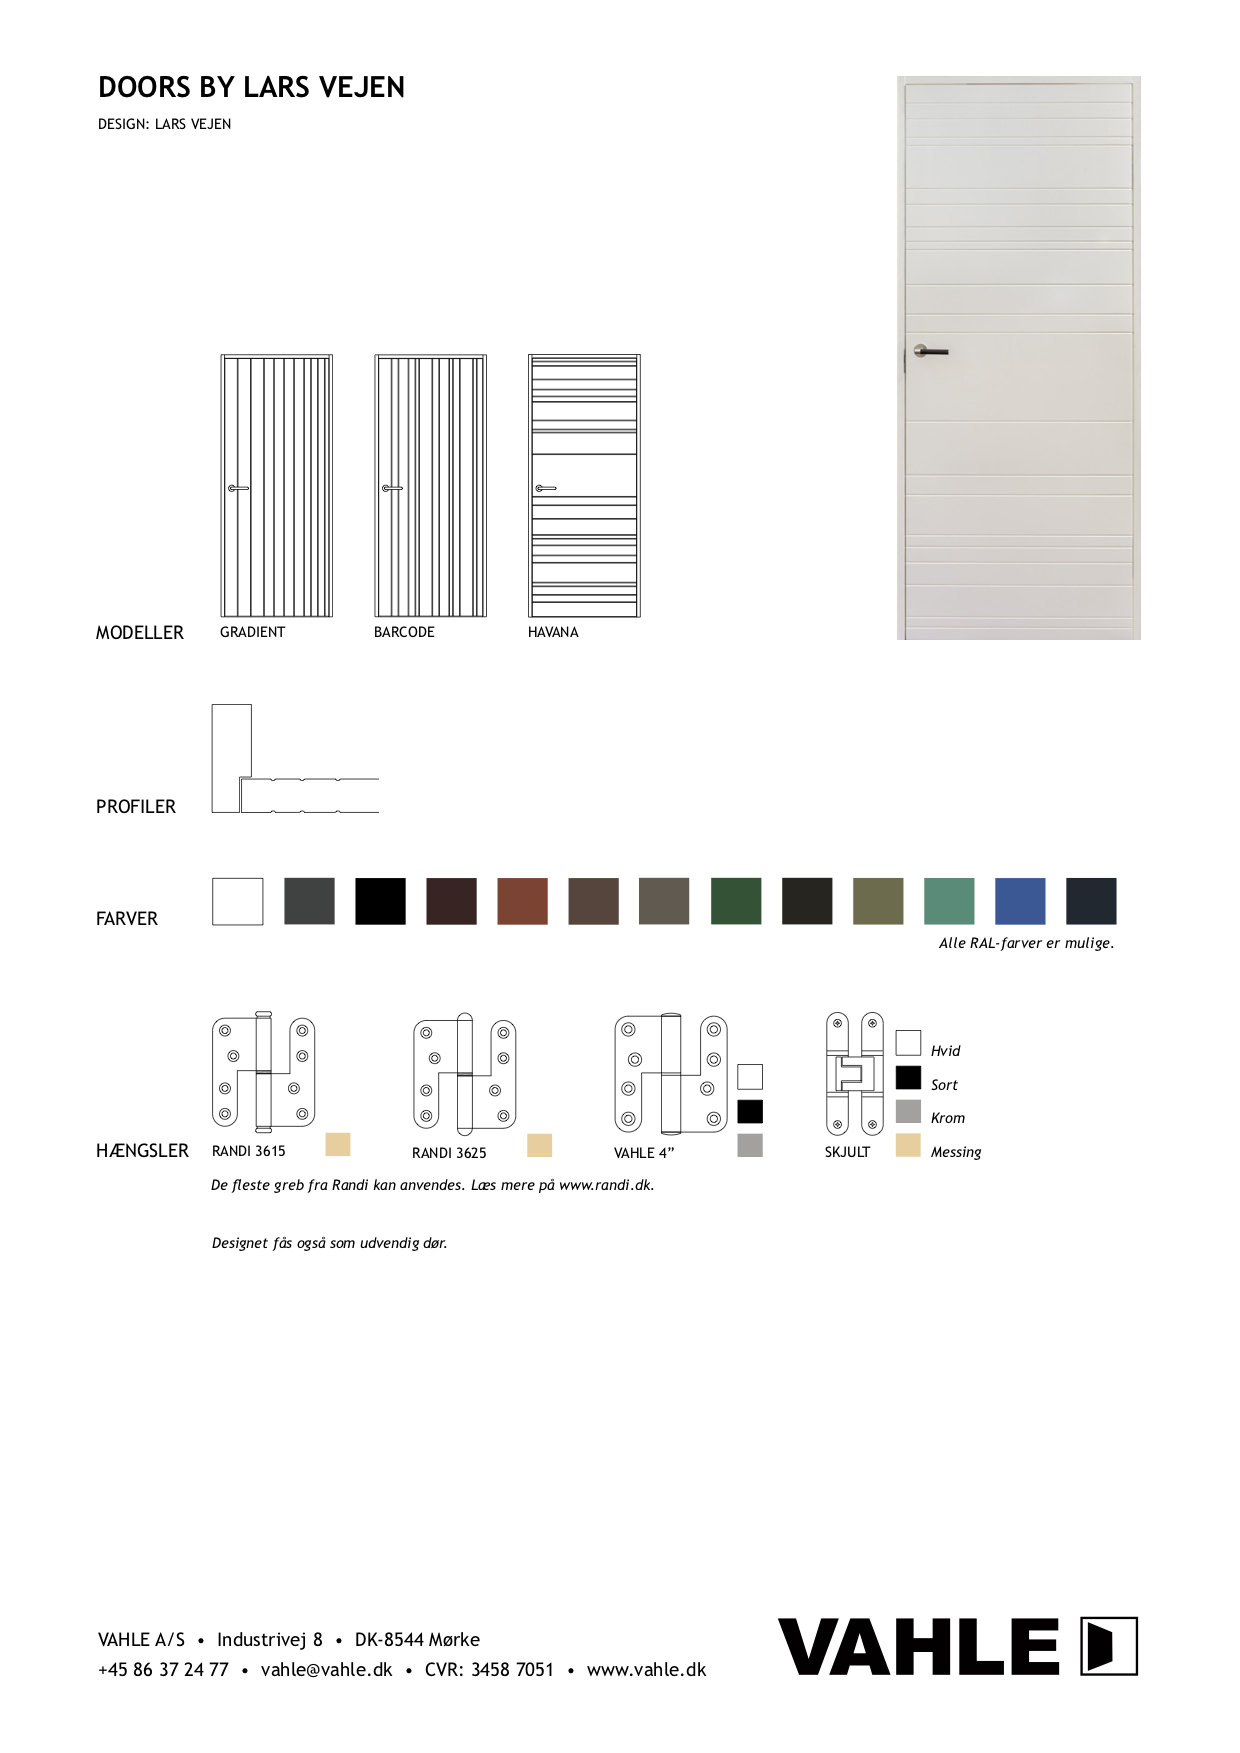 Doors by Lars Vejen for VAHLE